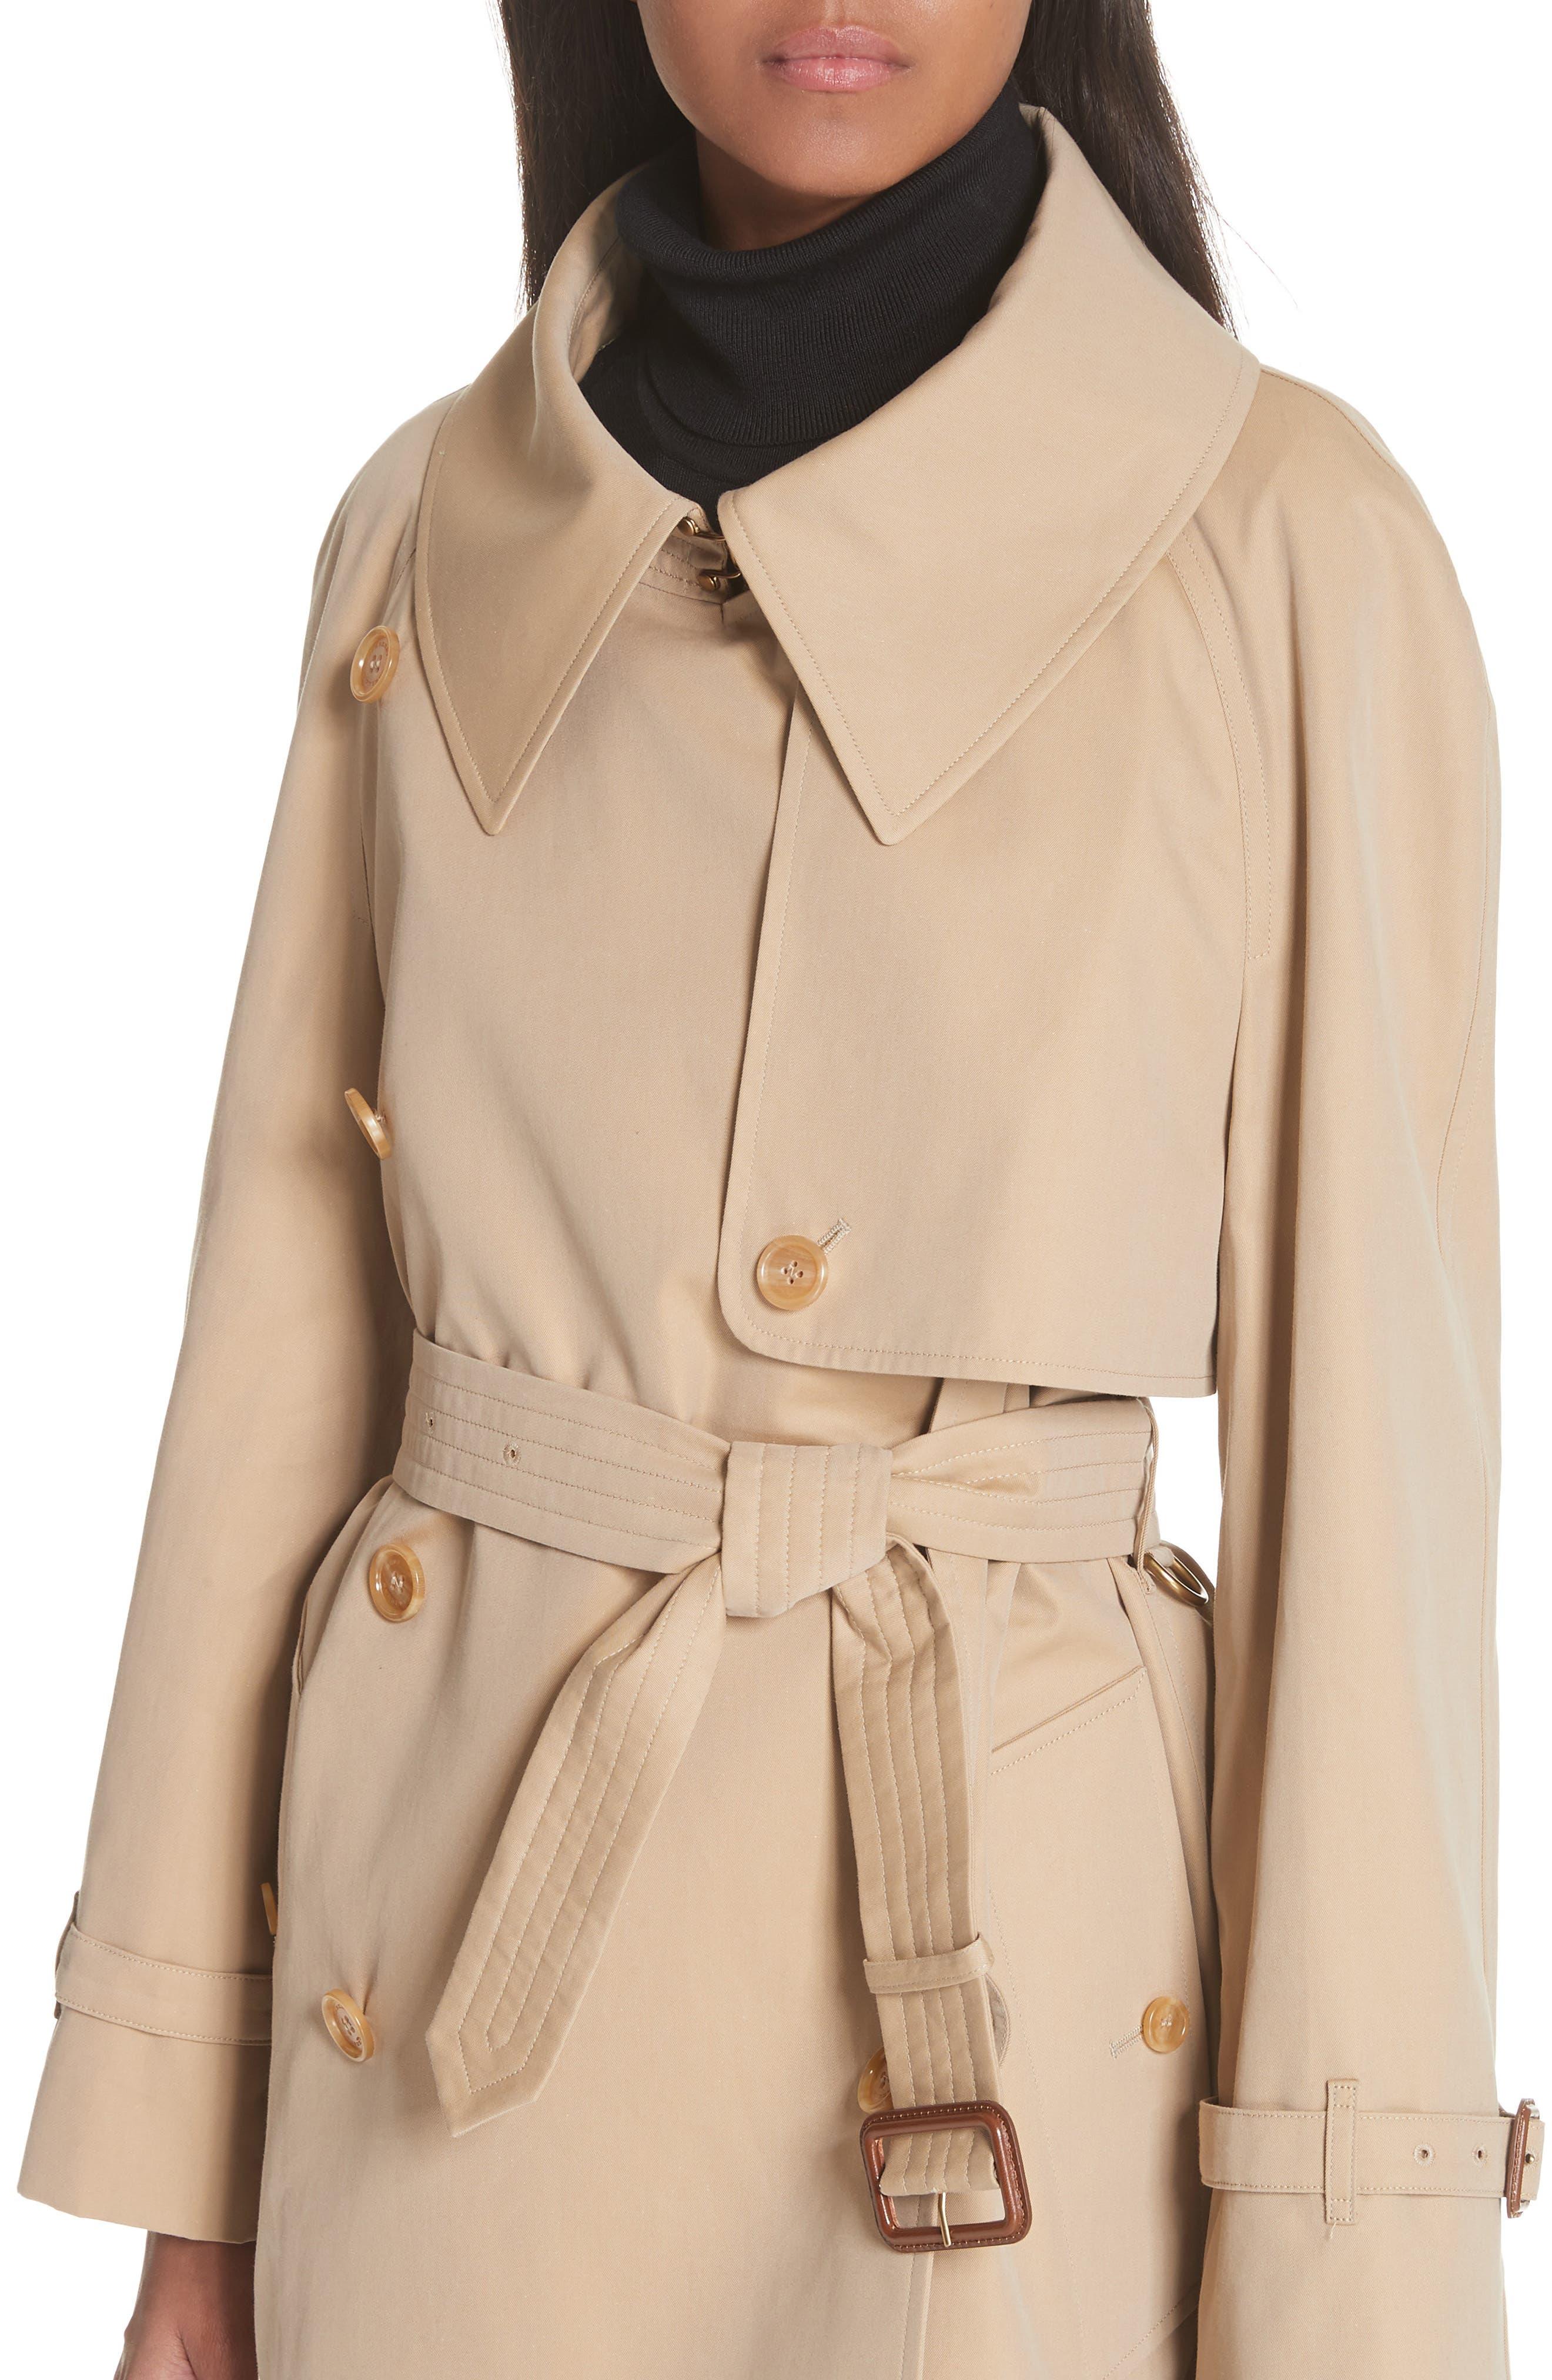 Fortingall Cotton Gabardine Trench Coat,                             Alternate thumbnail 4, color,                             Honey